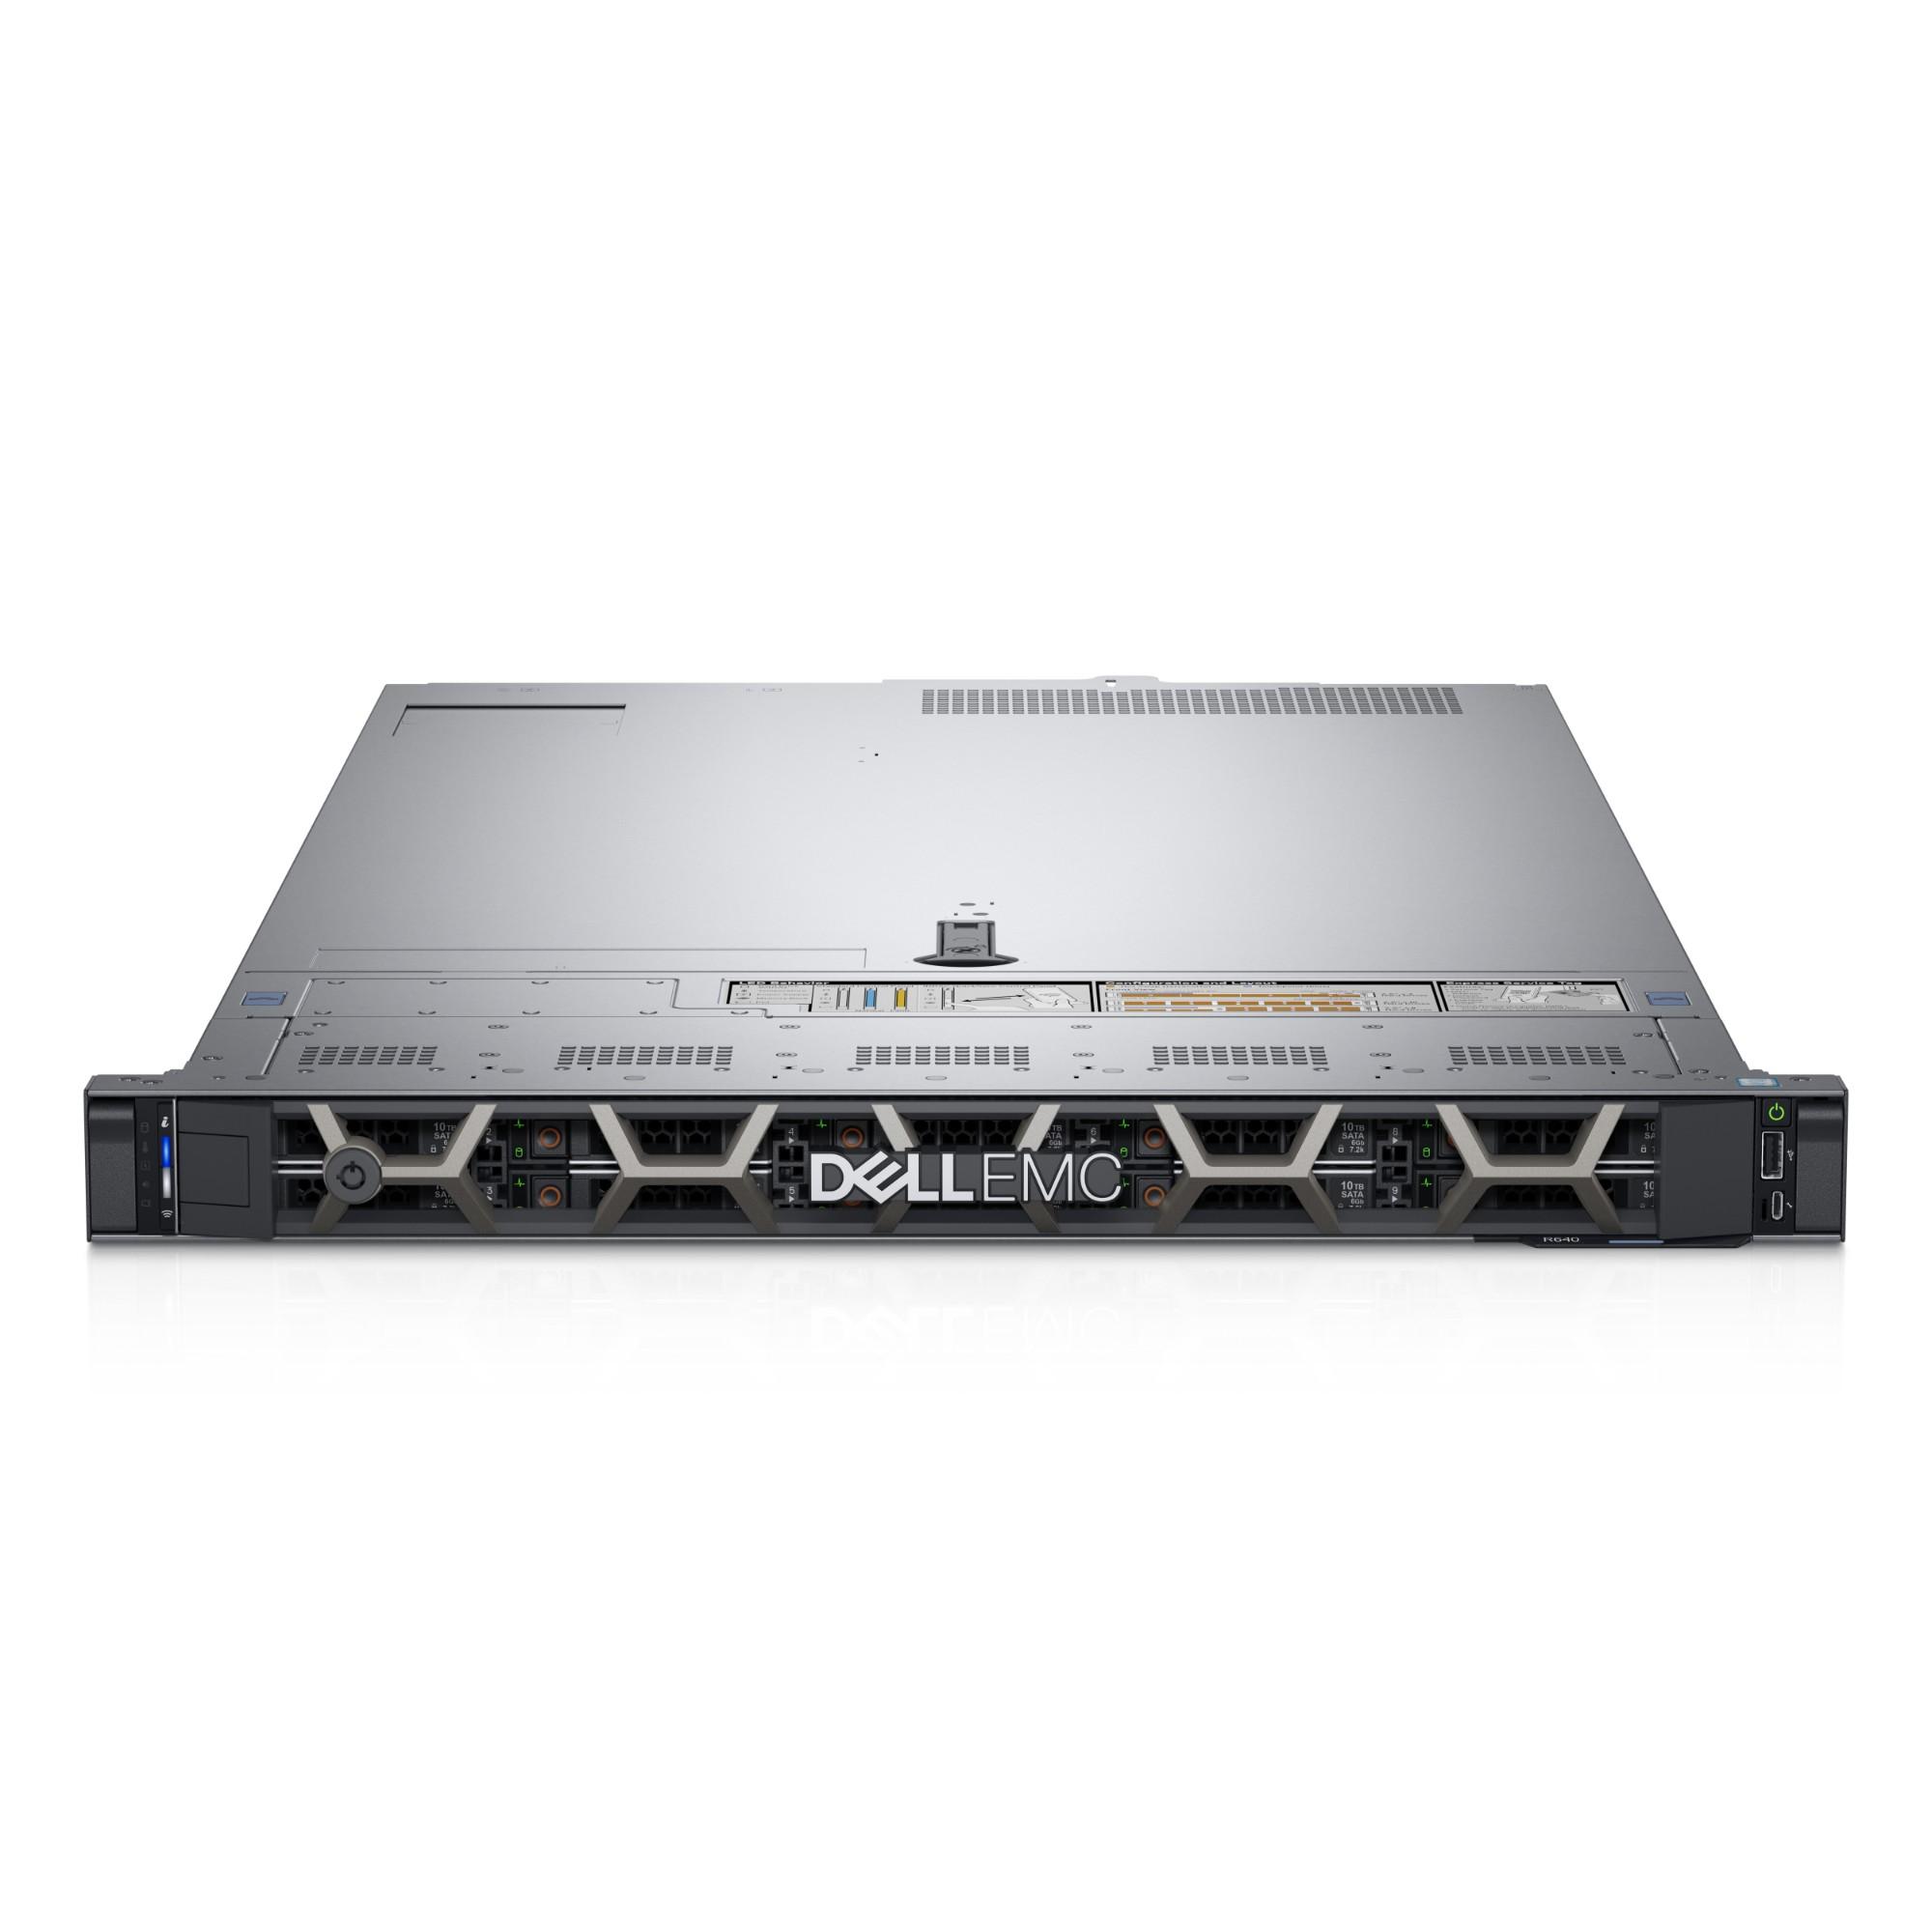 DELL PowerEdge R640 server 2 1 GHz Intel® Xeon® 4110 Rack (1U) 750 W